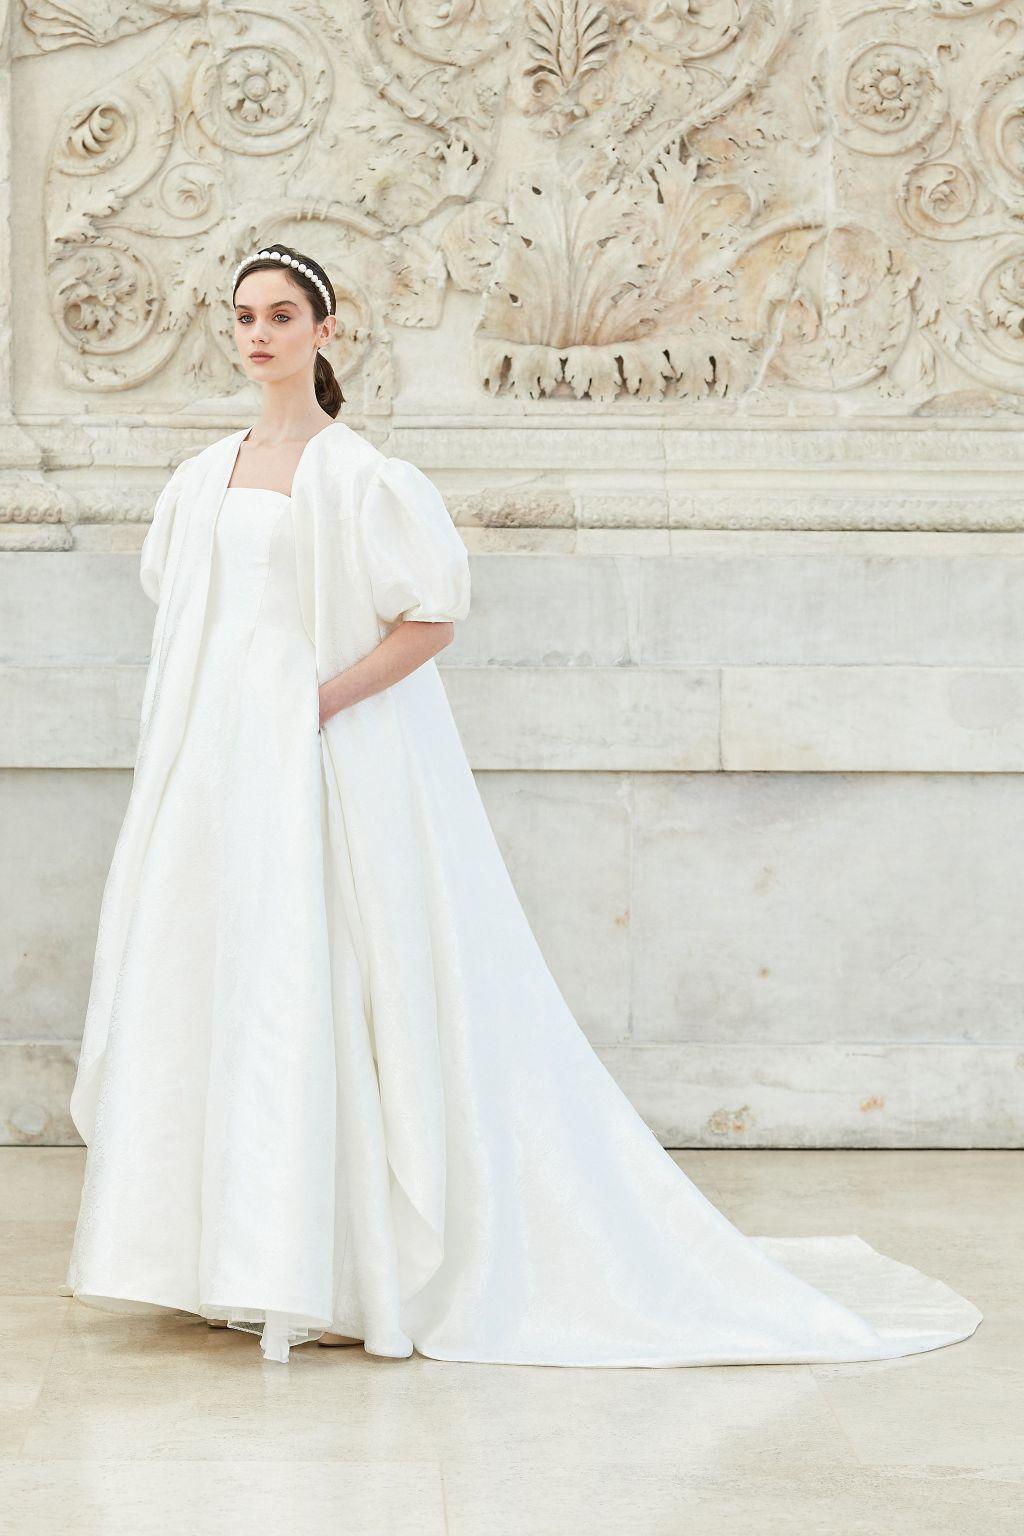 milan-fashion-week--daniela-gregis-autumn-winter-2022-collection-LauraBiagiottiAI21-22_AraPacis-AGEOFWomen_35.jpg